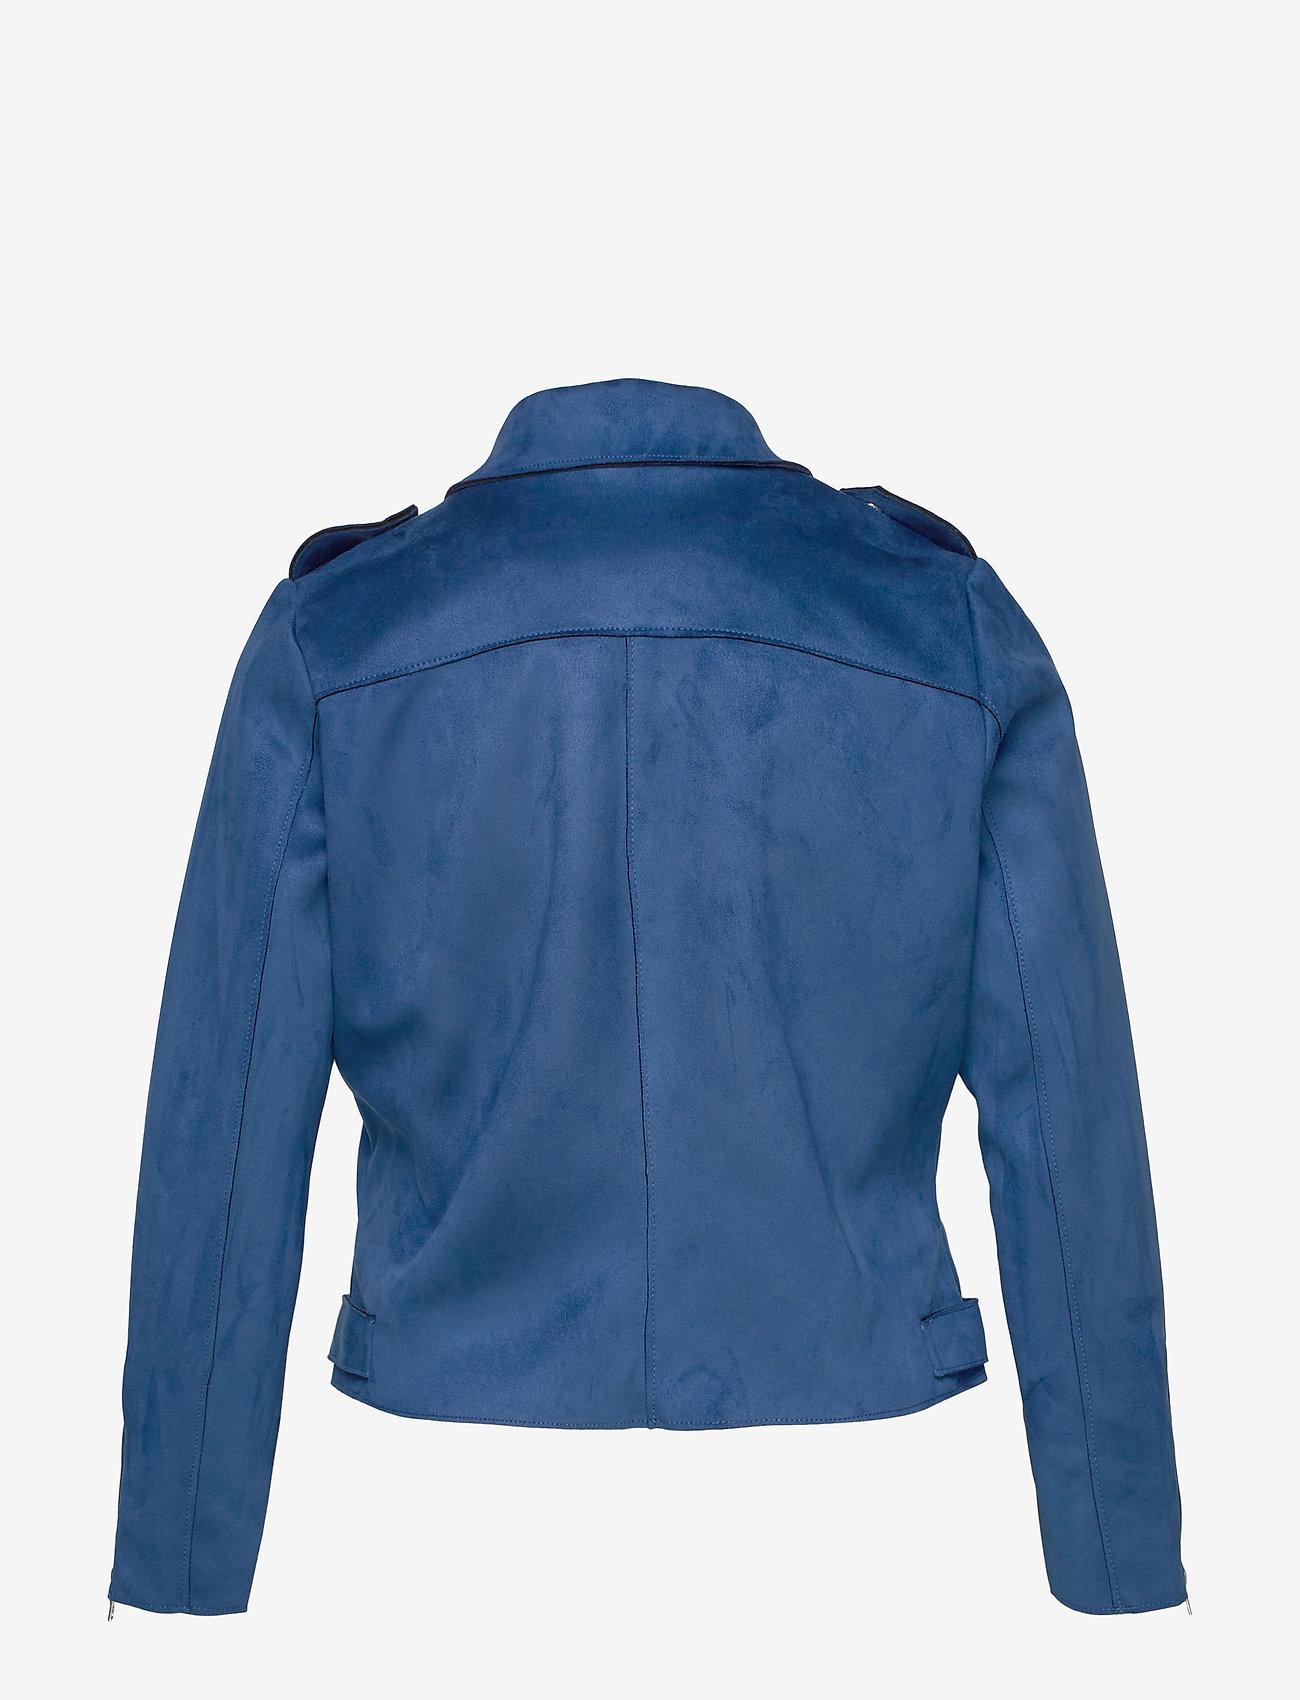 Only Carmakoma Carsherry Bonded Biker Otw - Jackor & Kappor Mazarine Blue